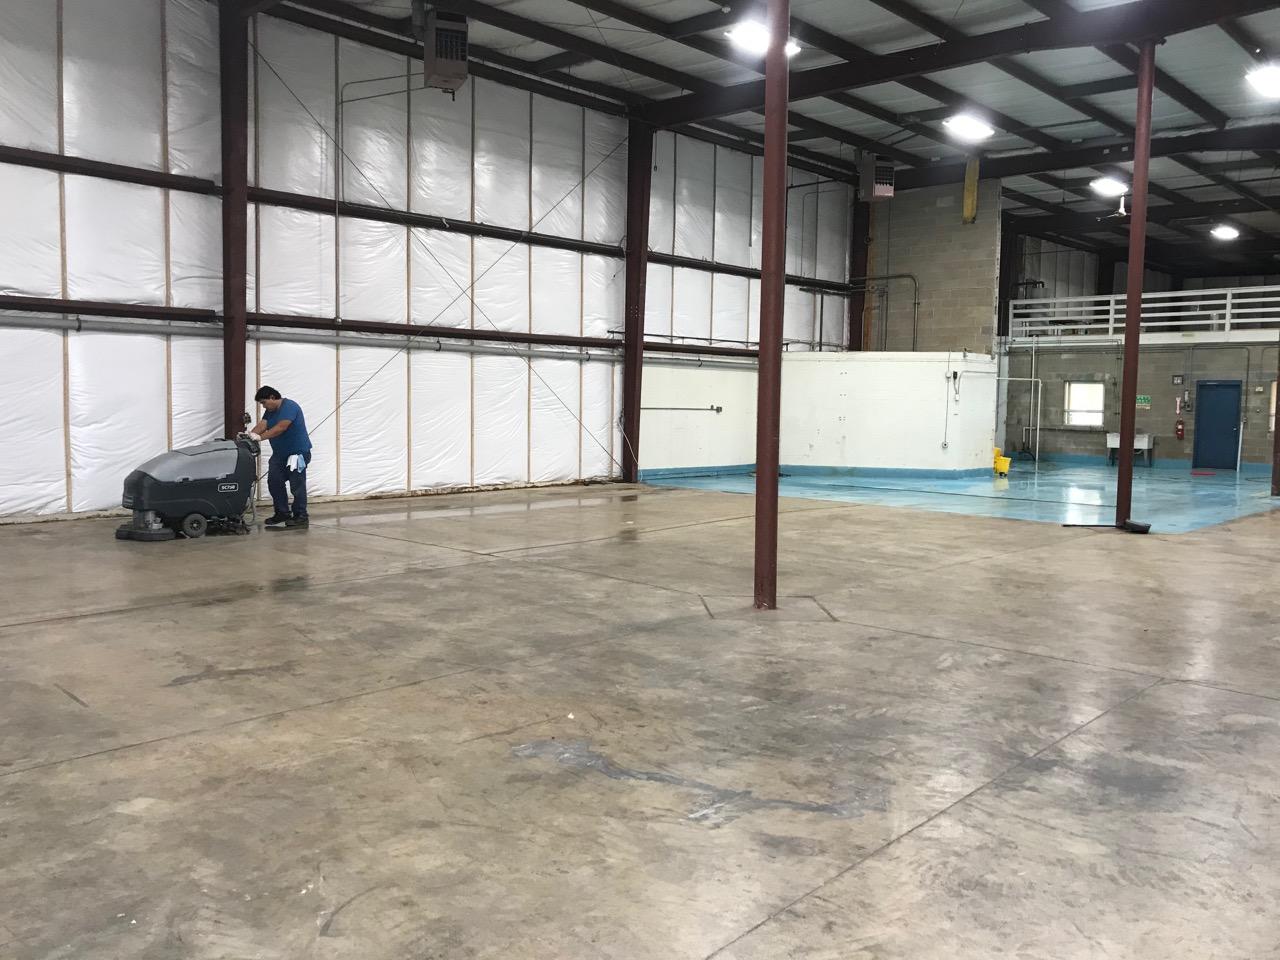 Summit prepares large development company for new tenant